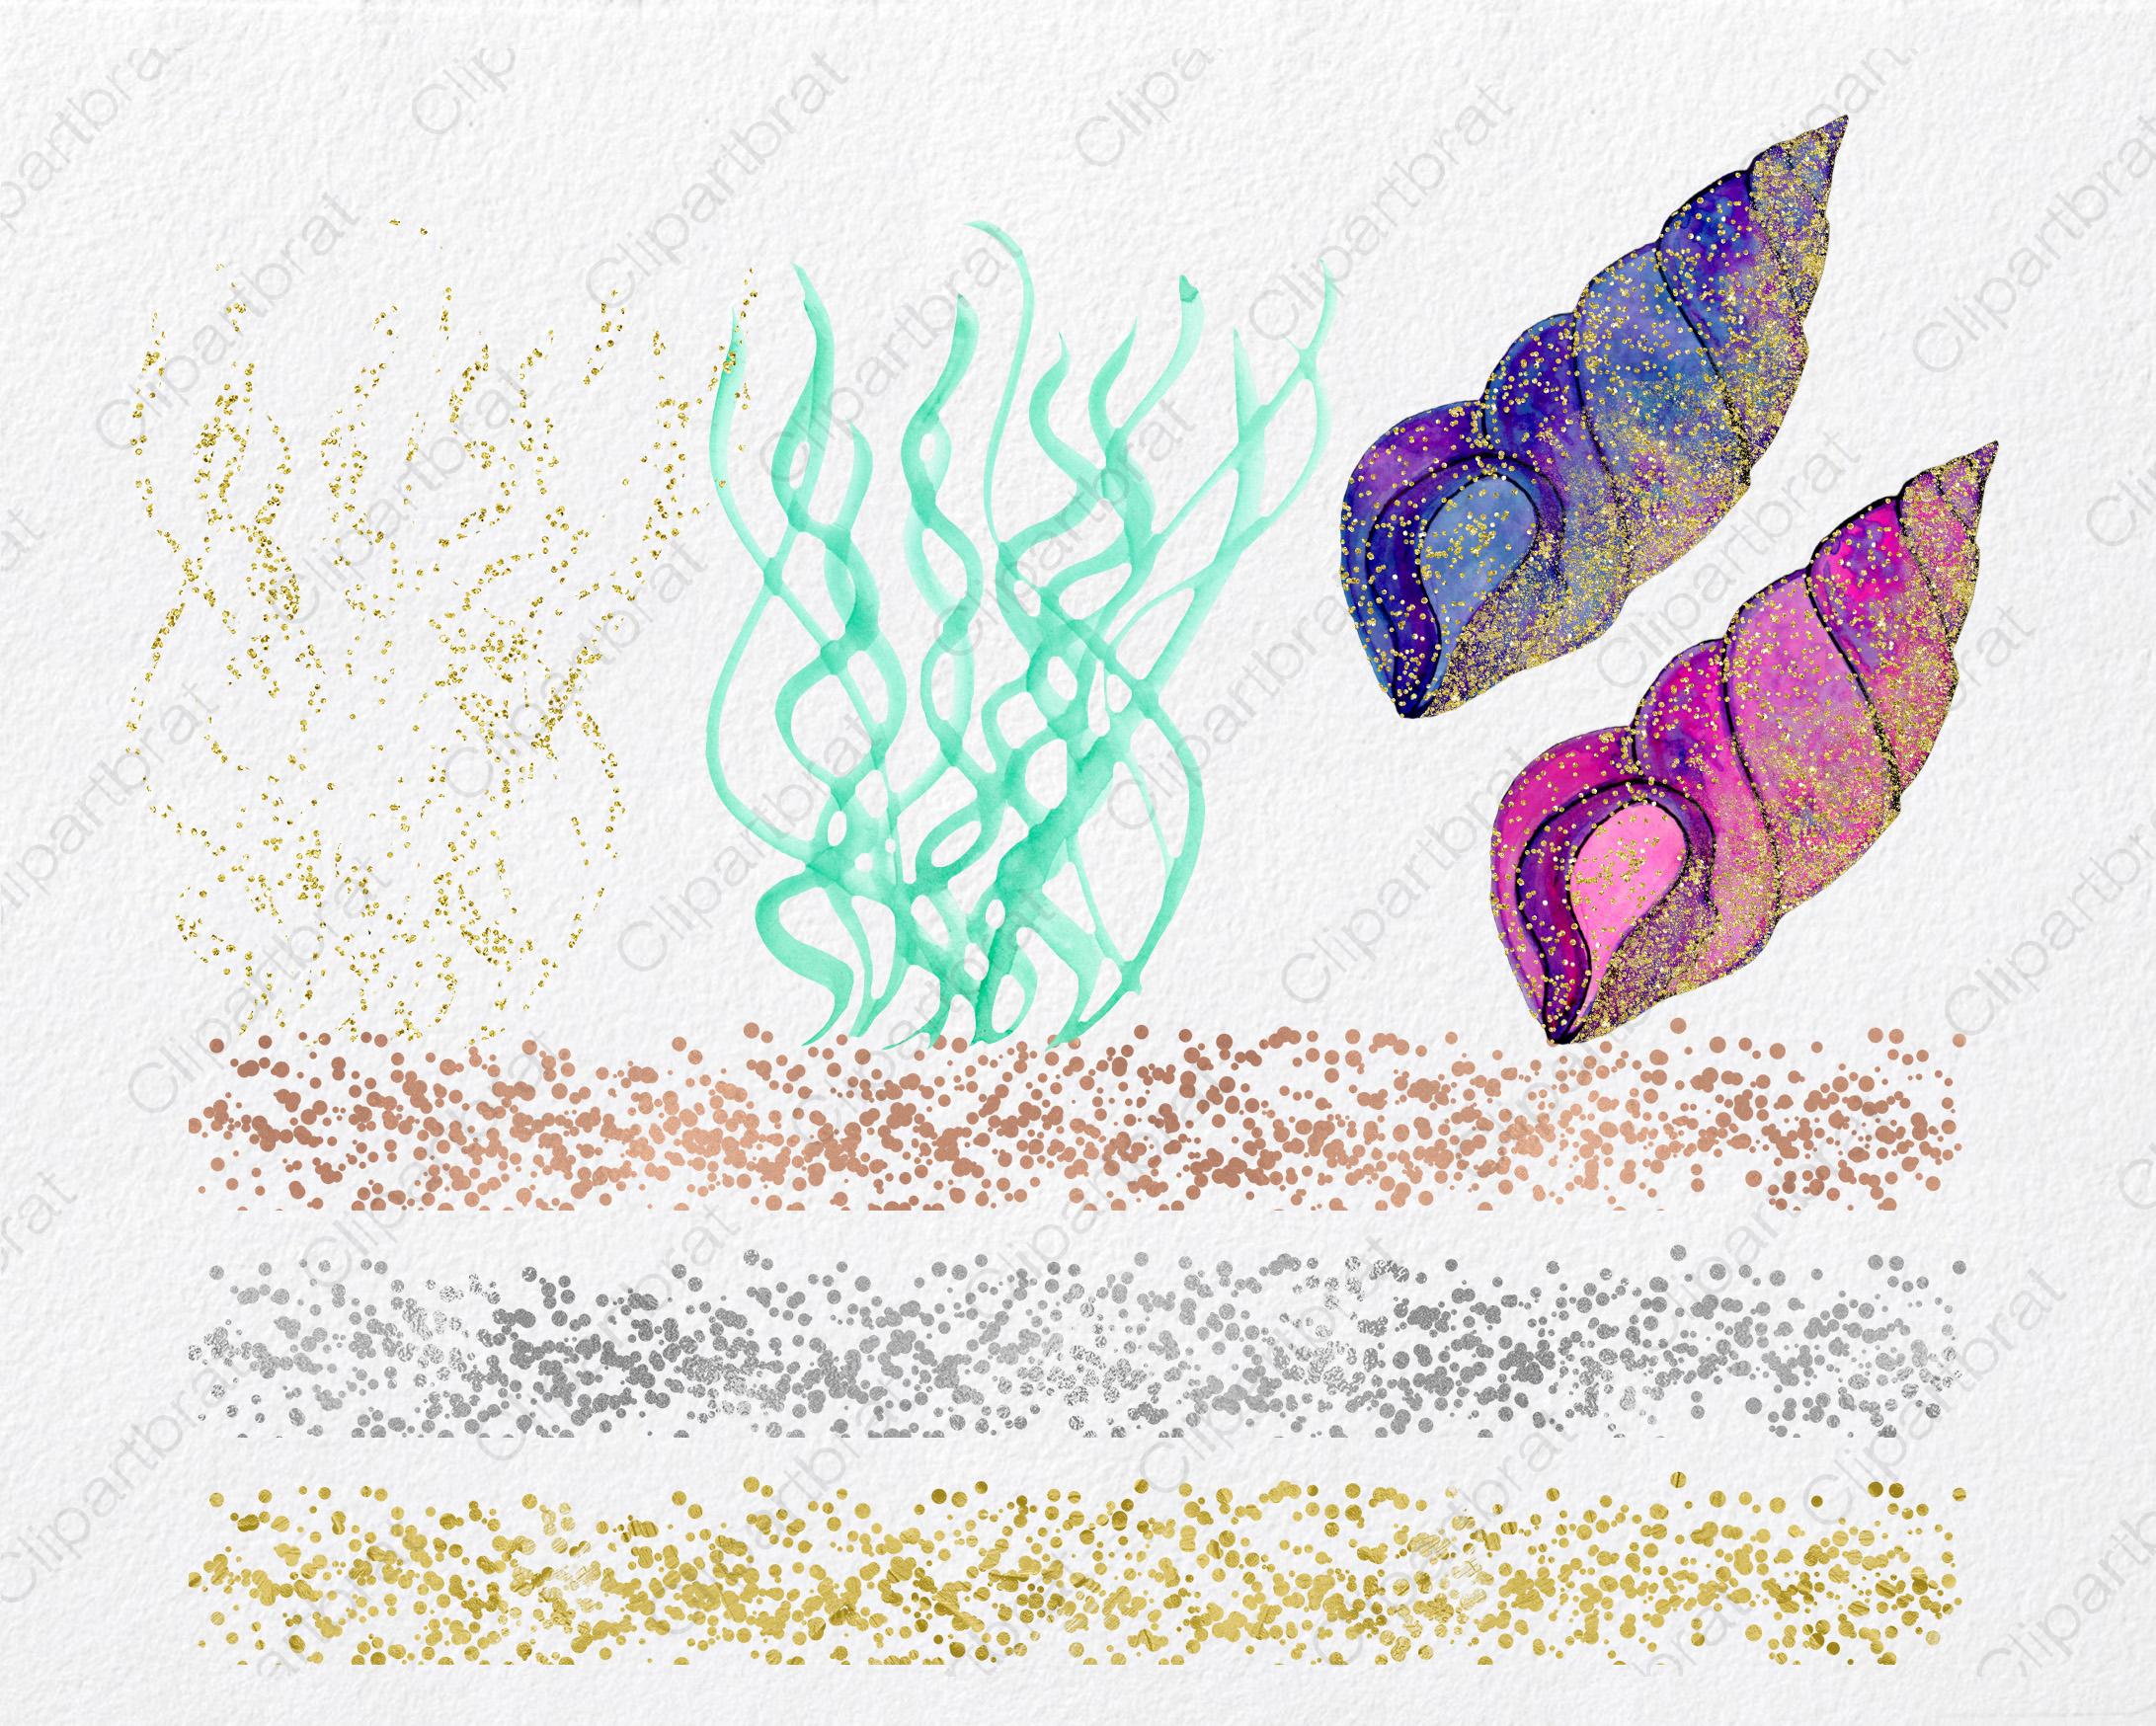 WATERCOLOR MERMAID Clipart  with Metallic Gold Confetti Mermaids Shells Starfish Ocean Watercolour Splash Graphics example image 2